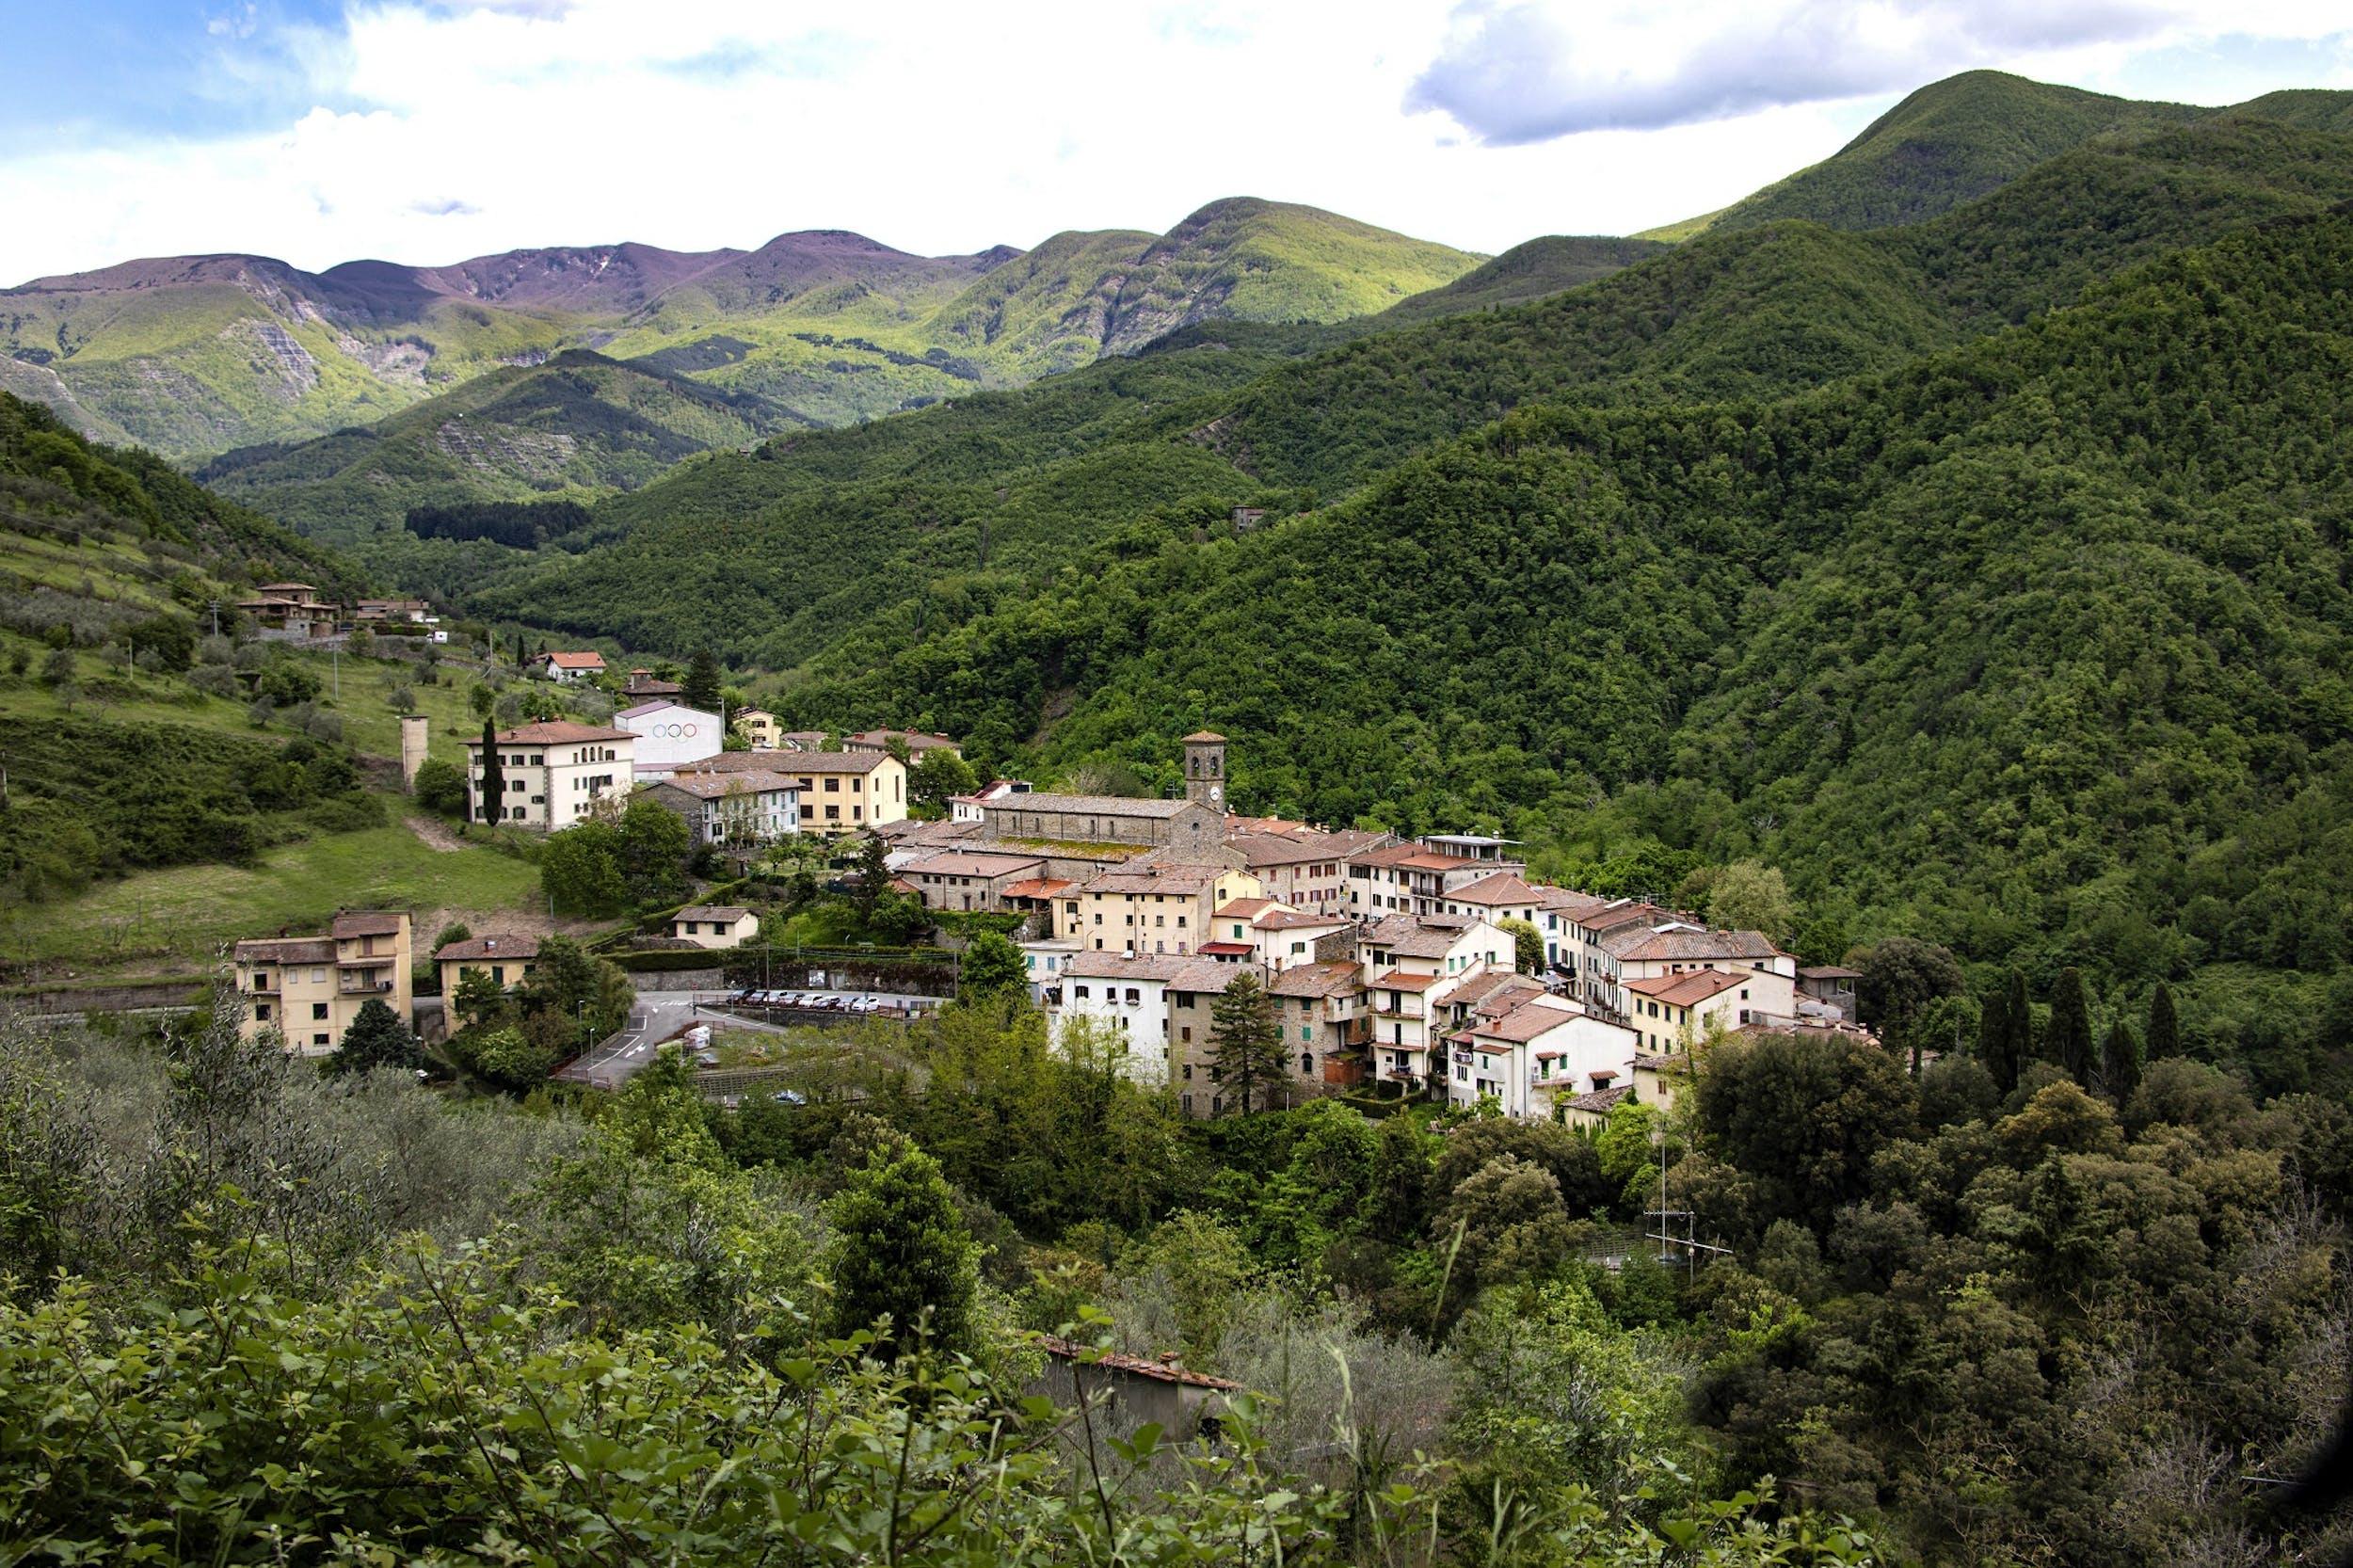 San Godenzo